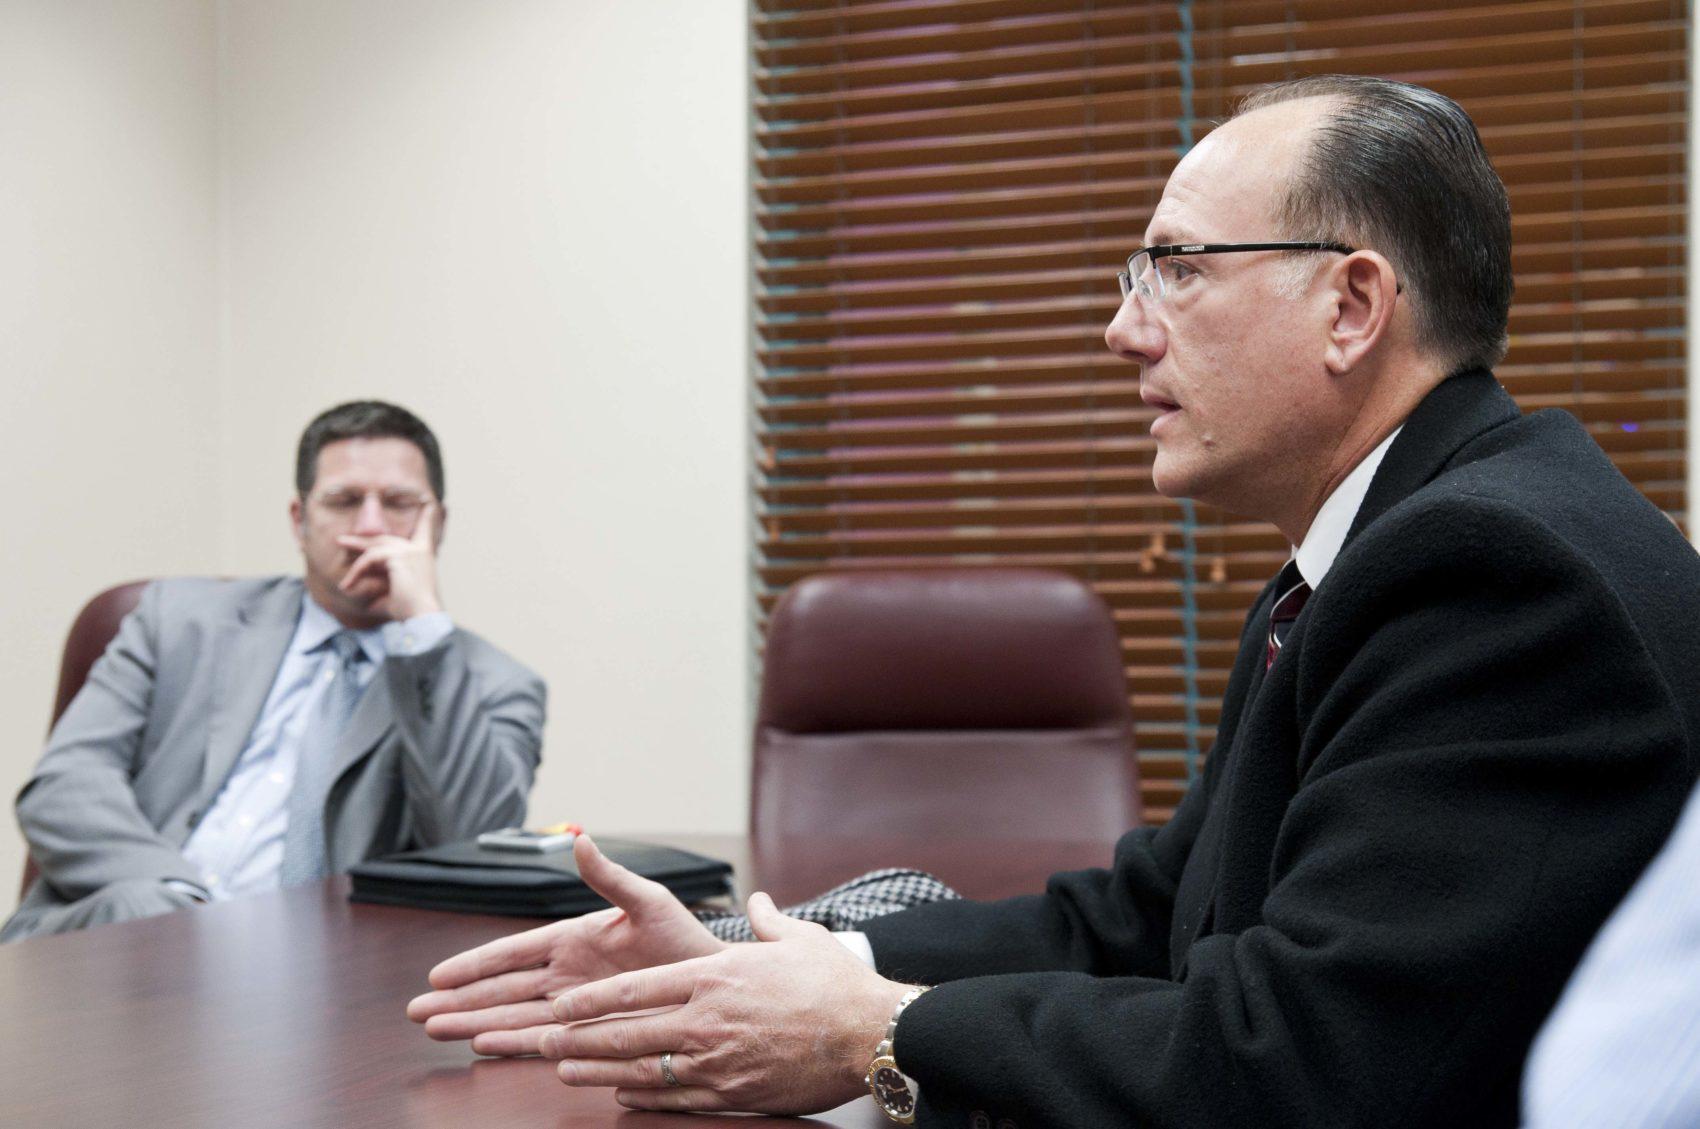 Image of men in meeting room